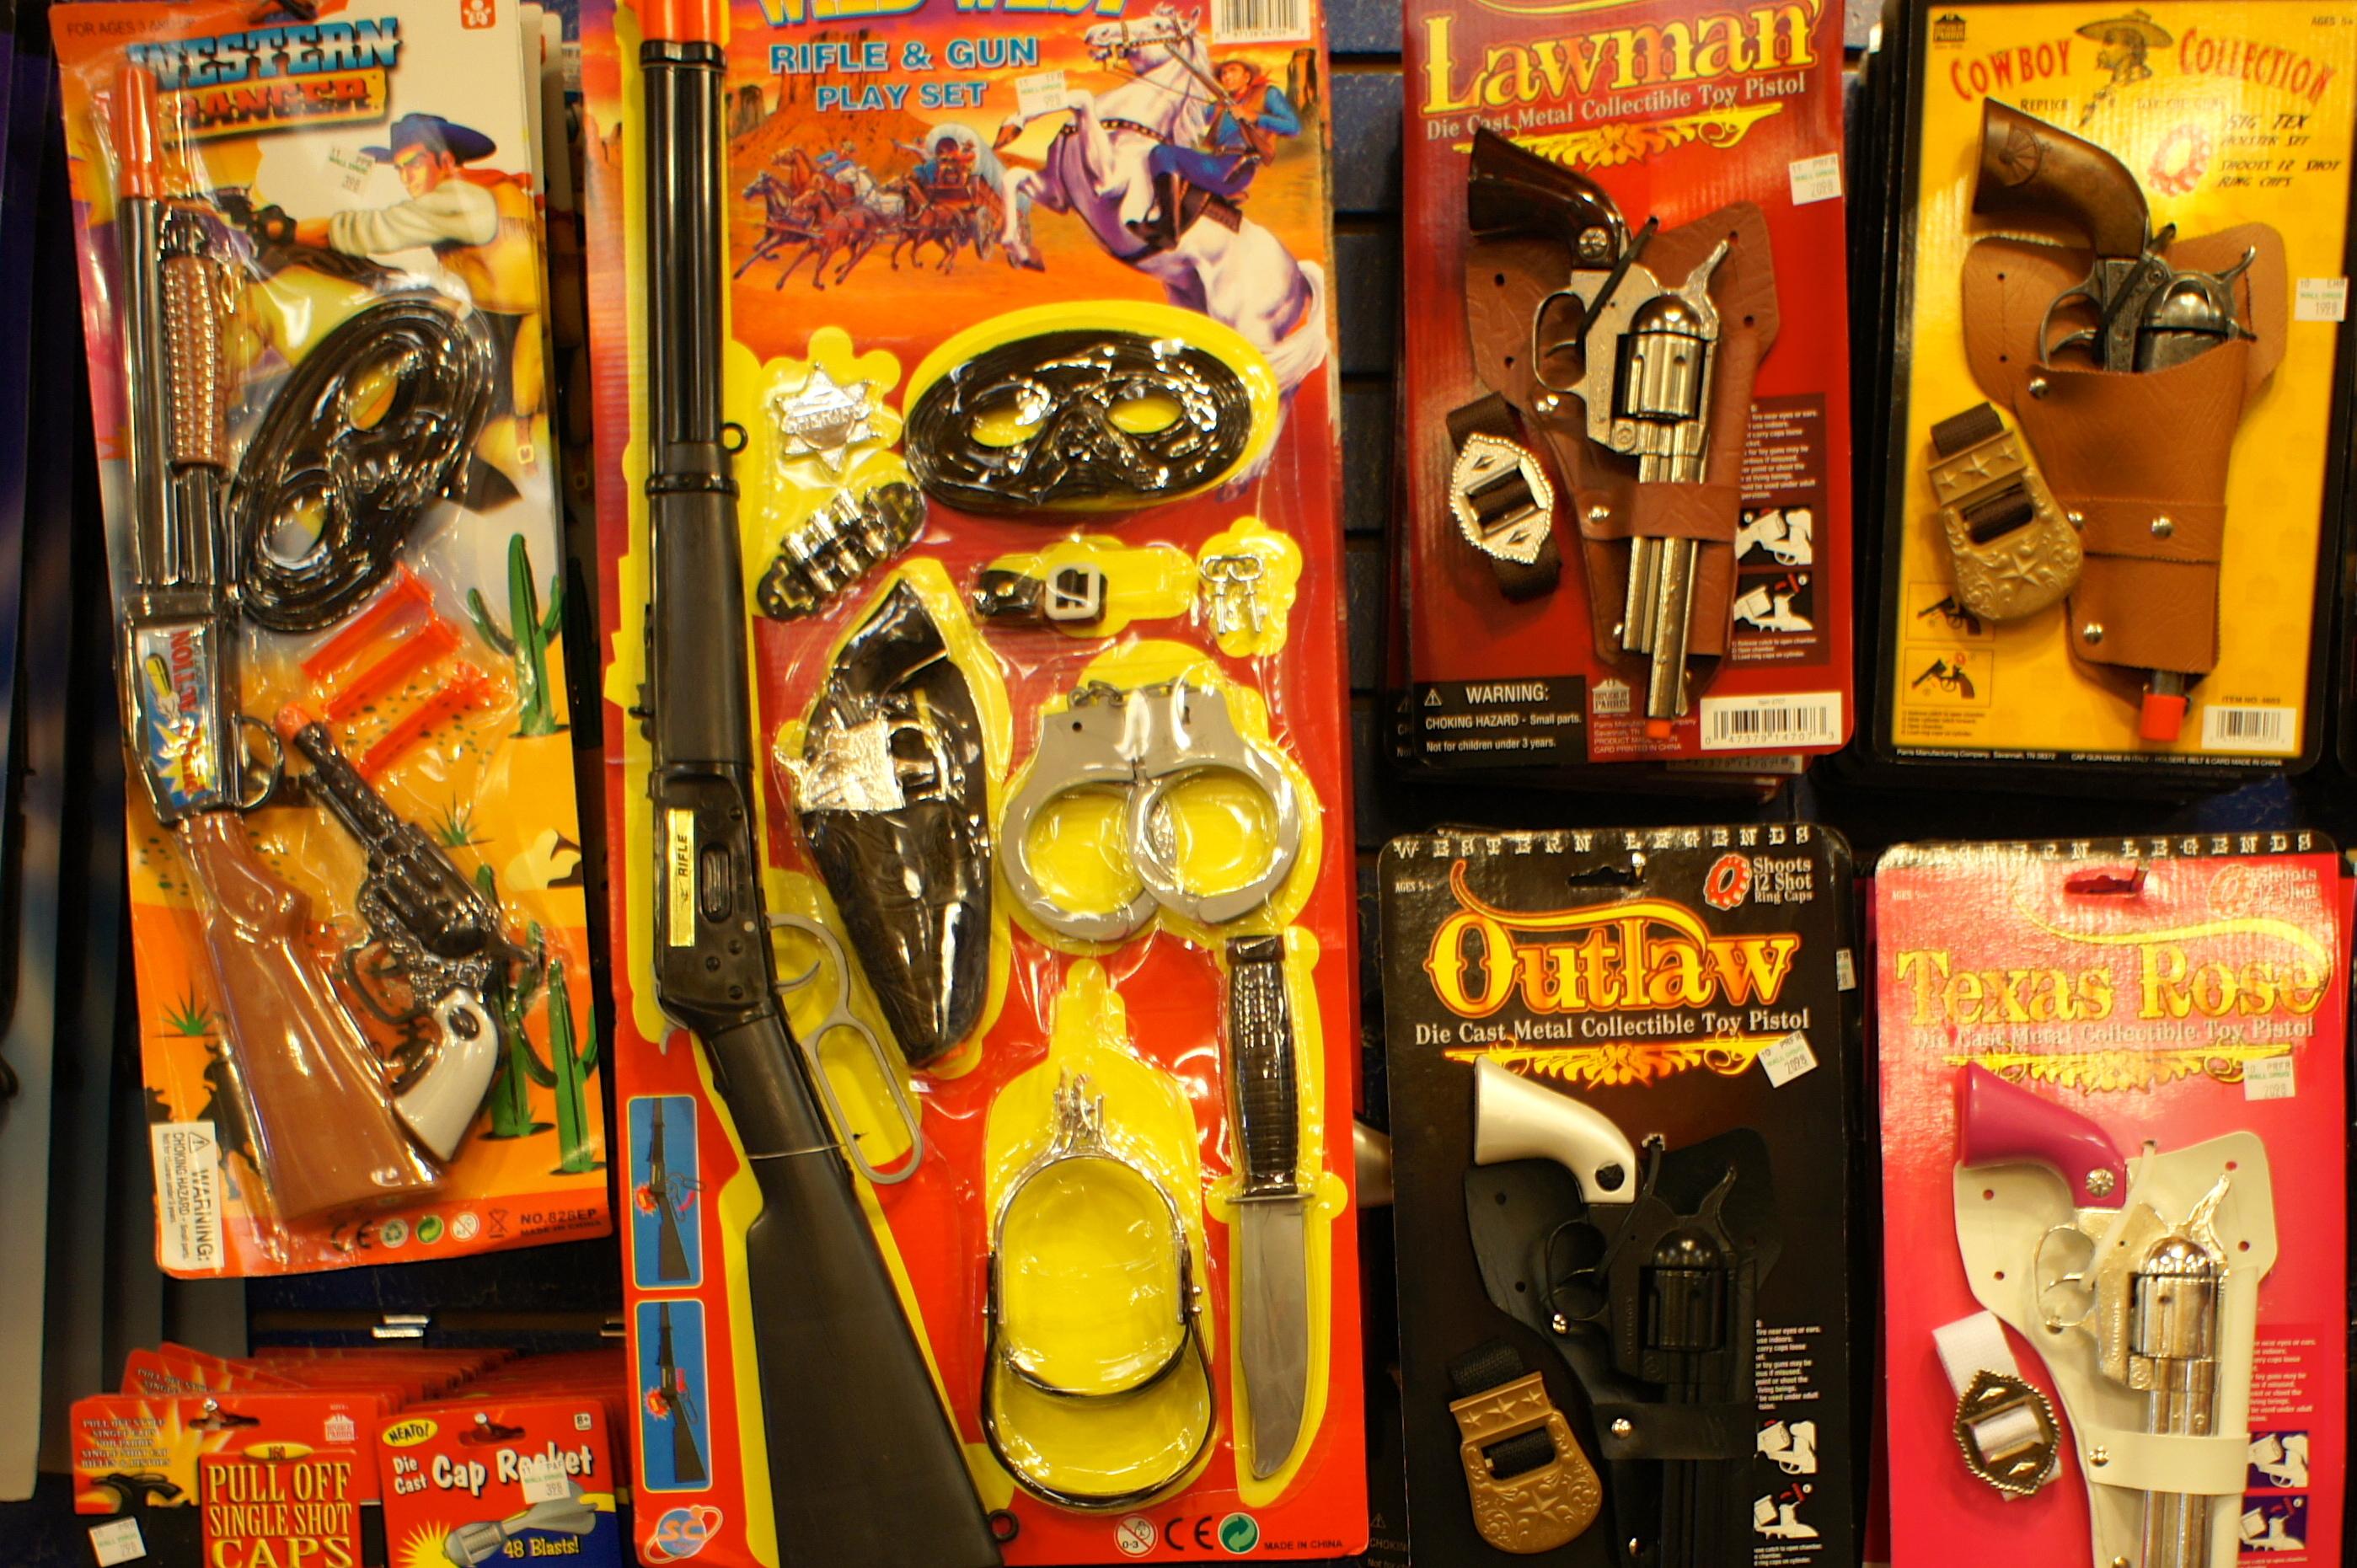 Walmart Toy Guns For Boys : The gallery for gt toy guns kids walmart